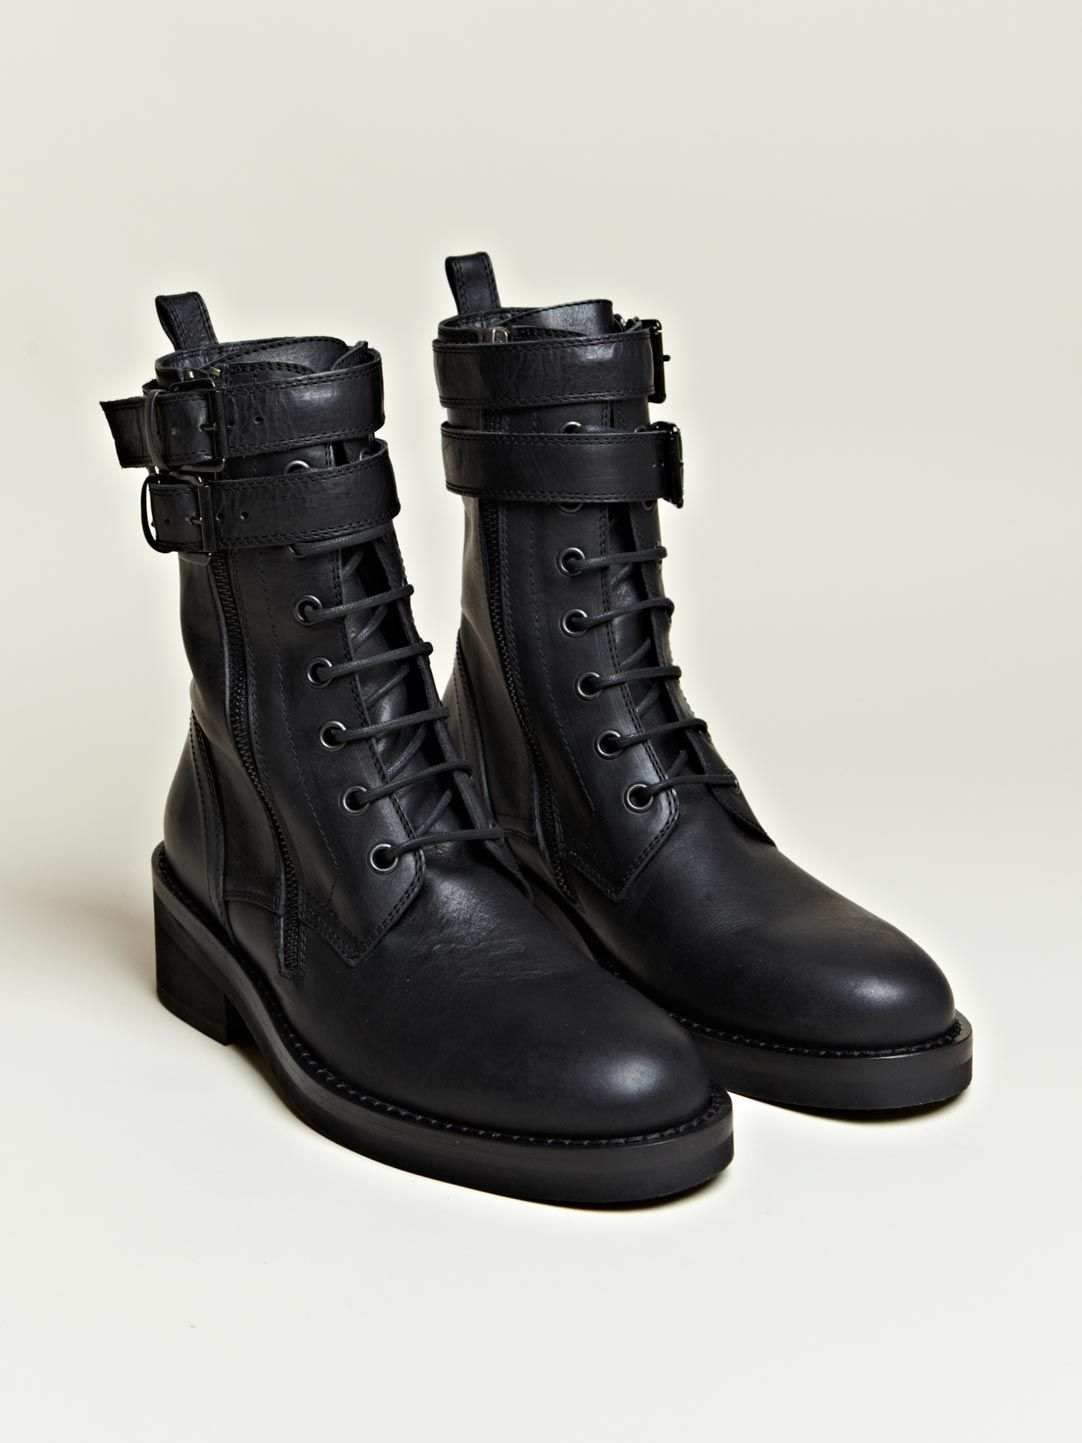 designer womens combat boots